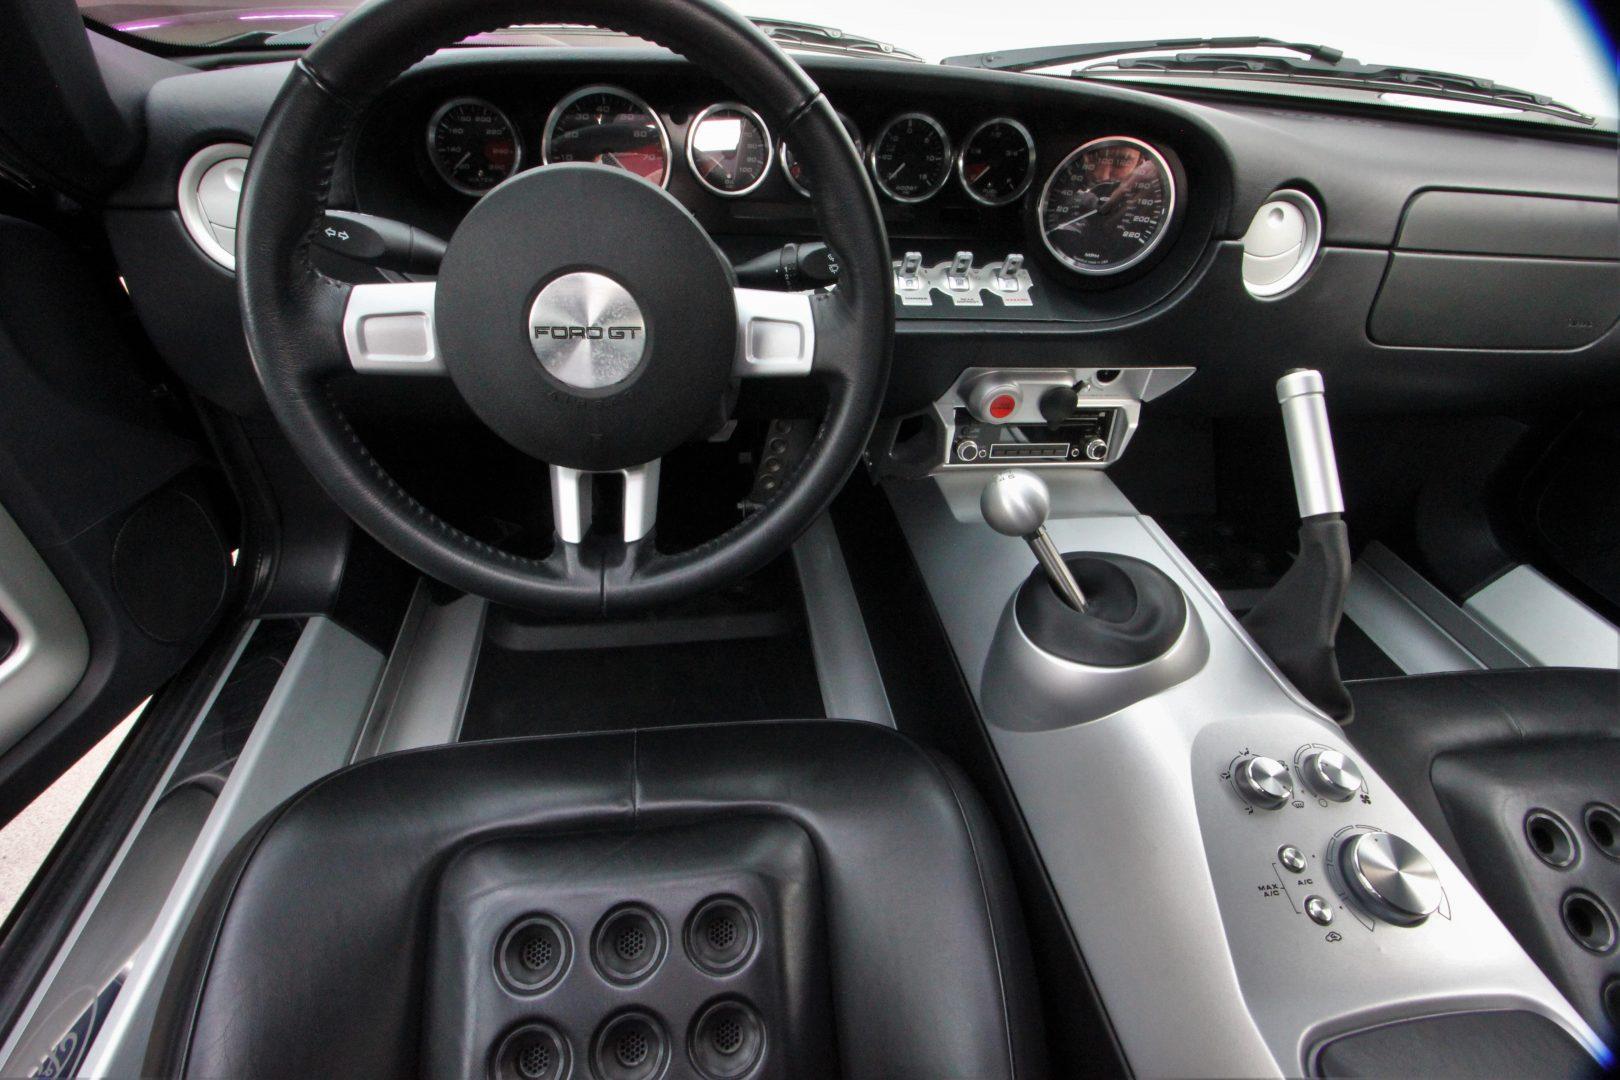 AIL Ford GT 5.4L V8 Supercharger 2